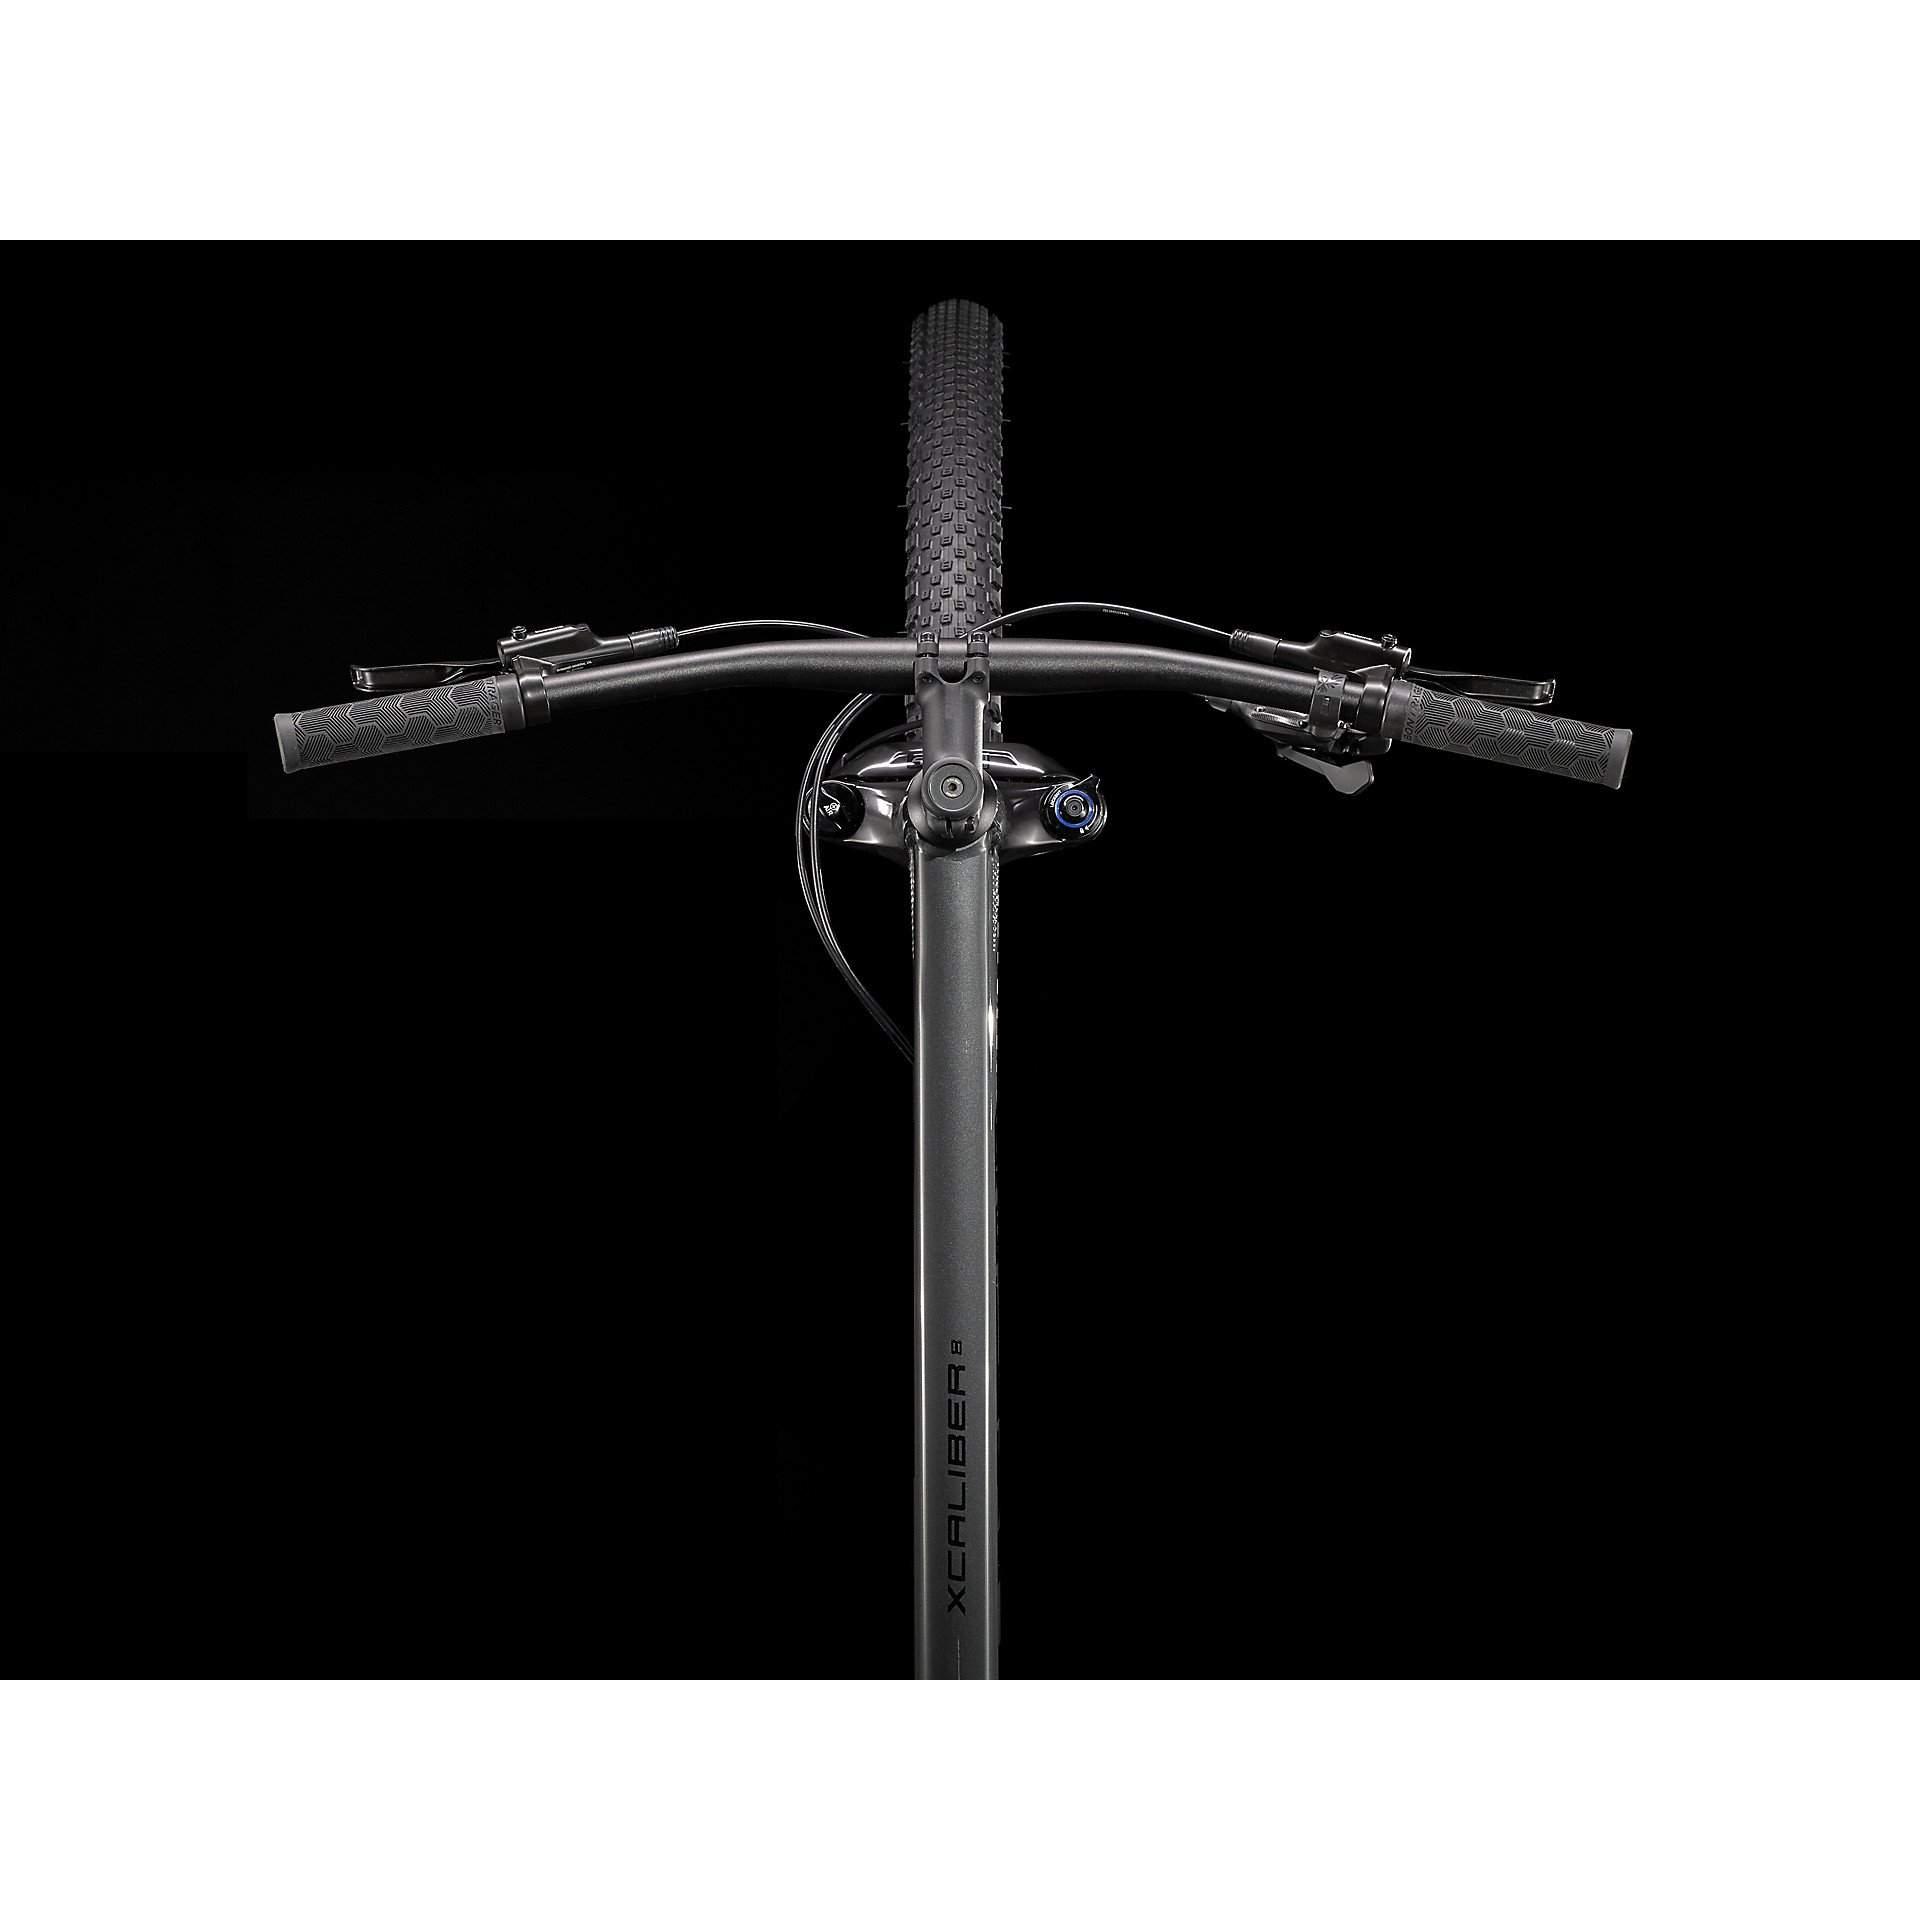 ROWER TREK X-CALIBER 8 LITHIUM GREY|TREK BLACK 92